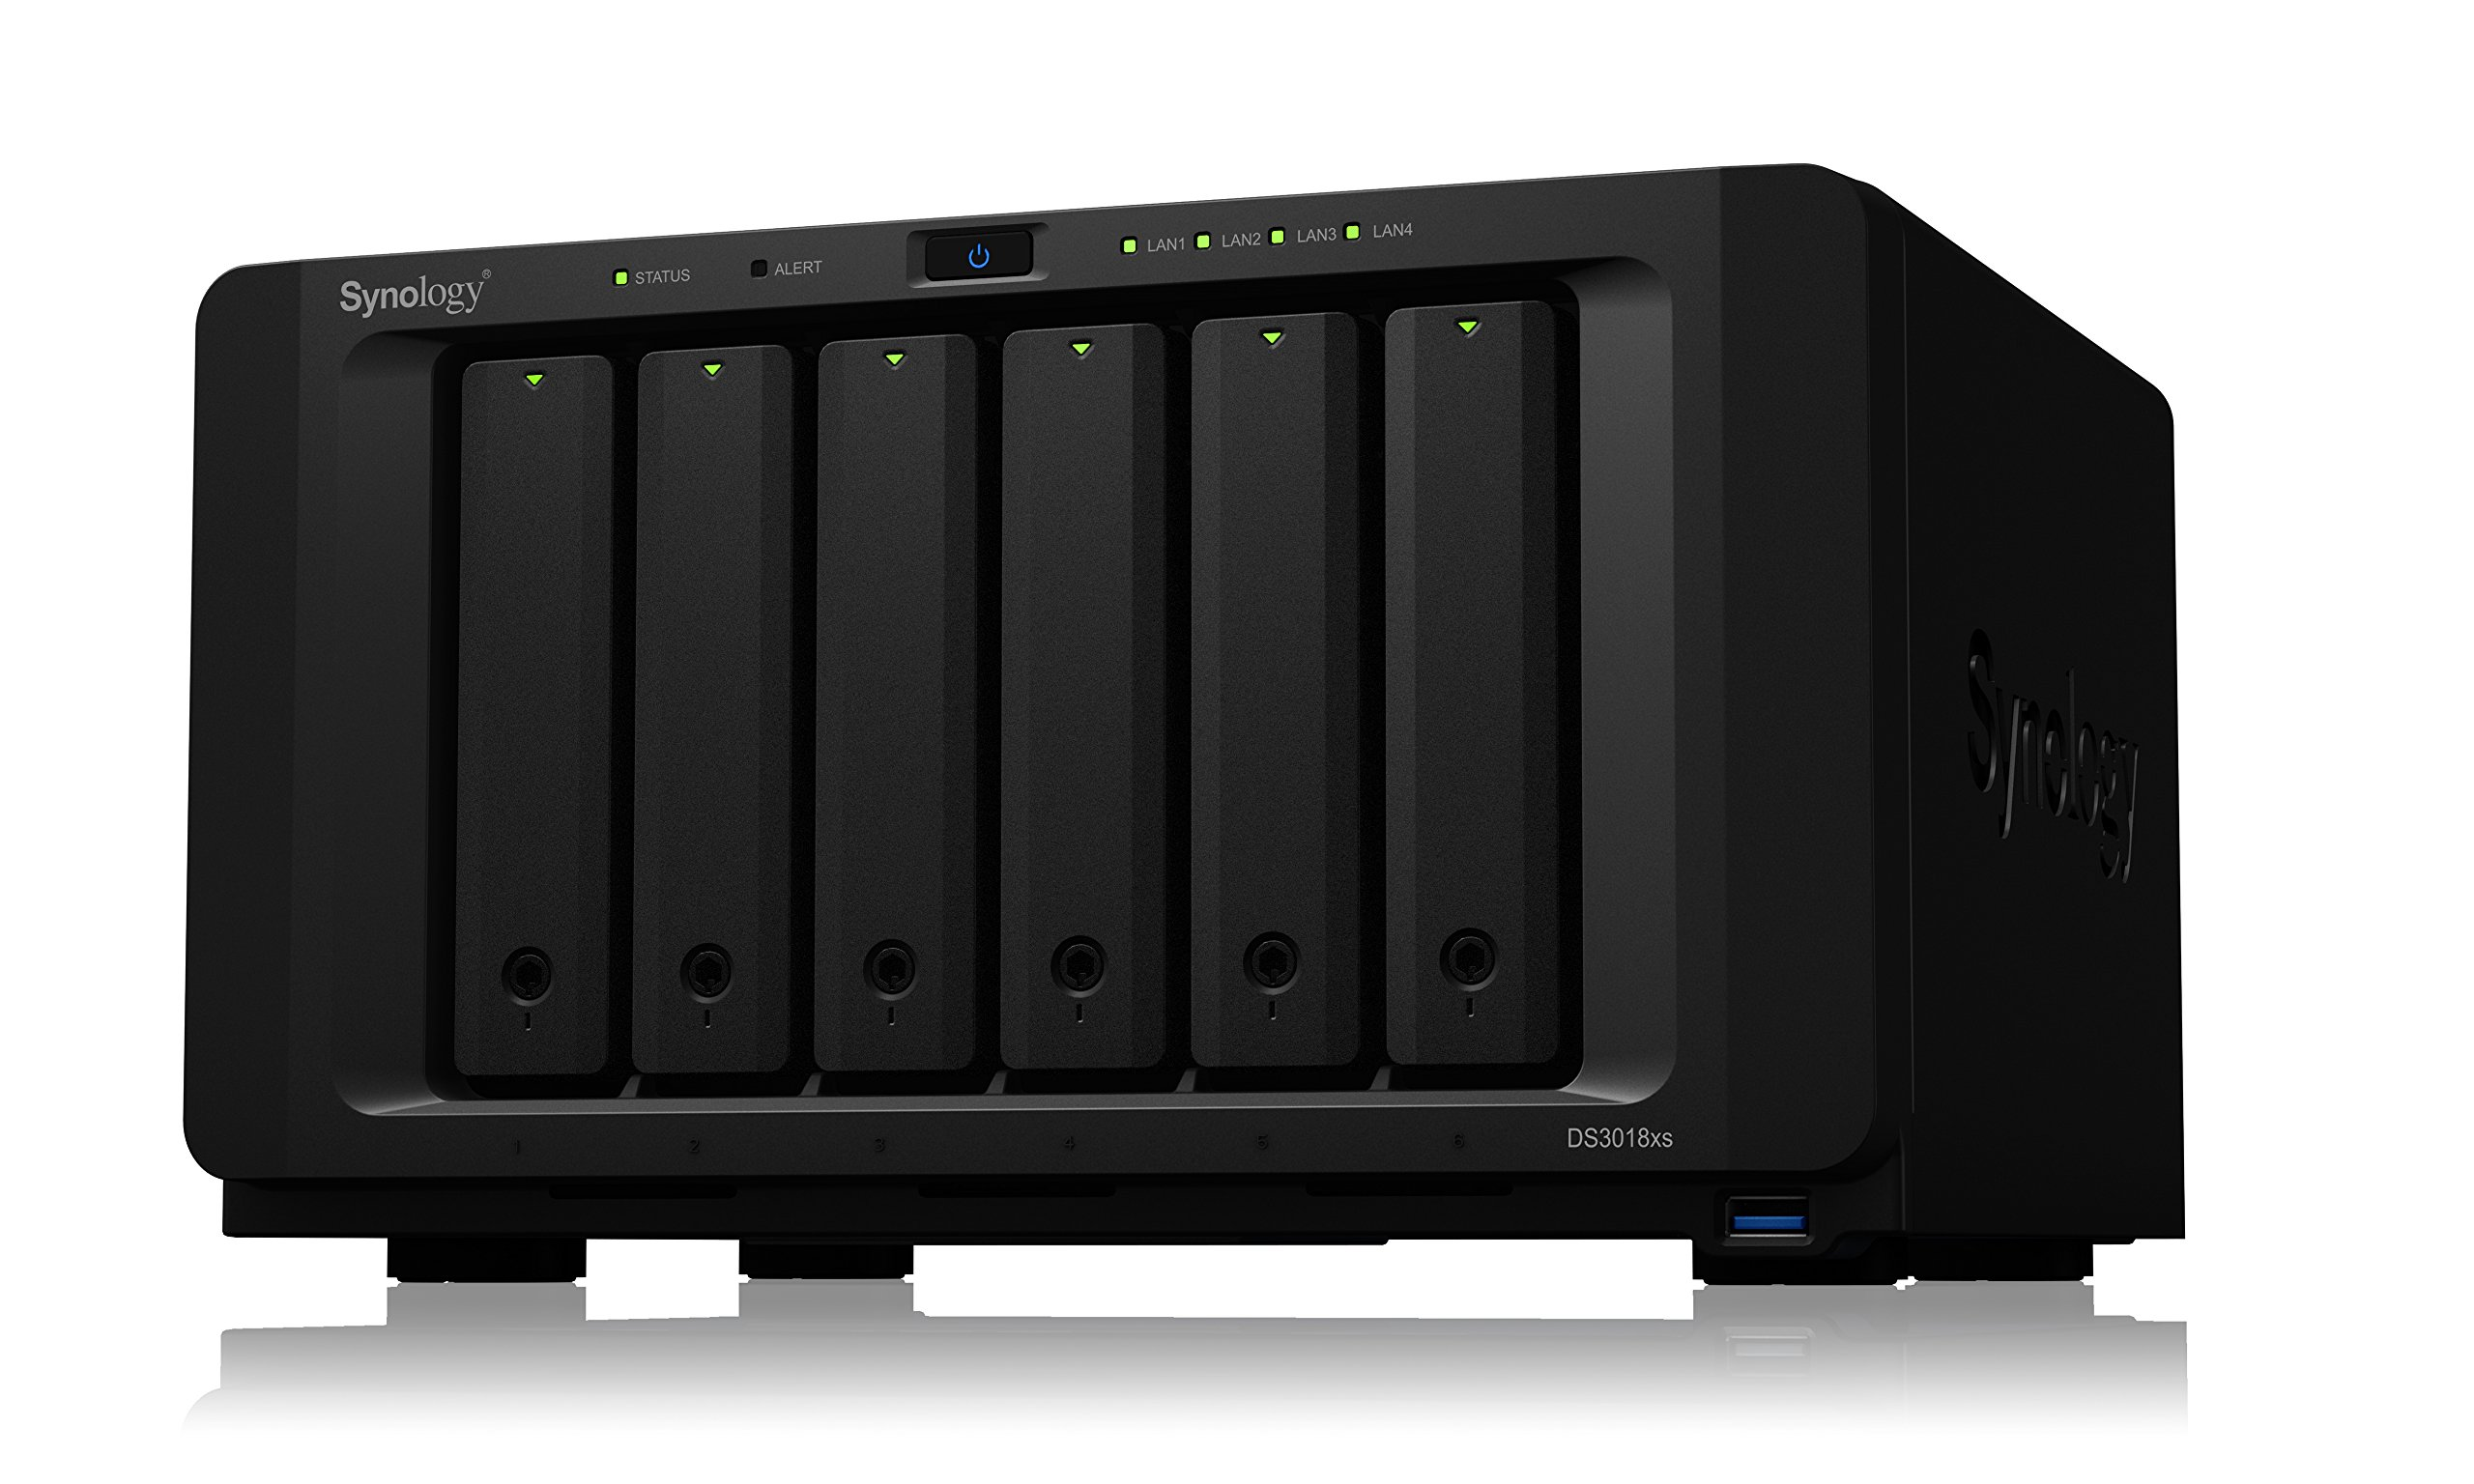 Synology 6 bay NAS DiskStation DS3018xs (Diskless)